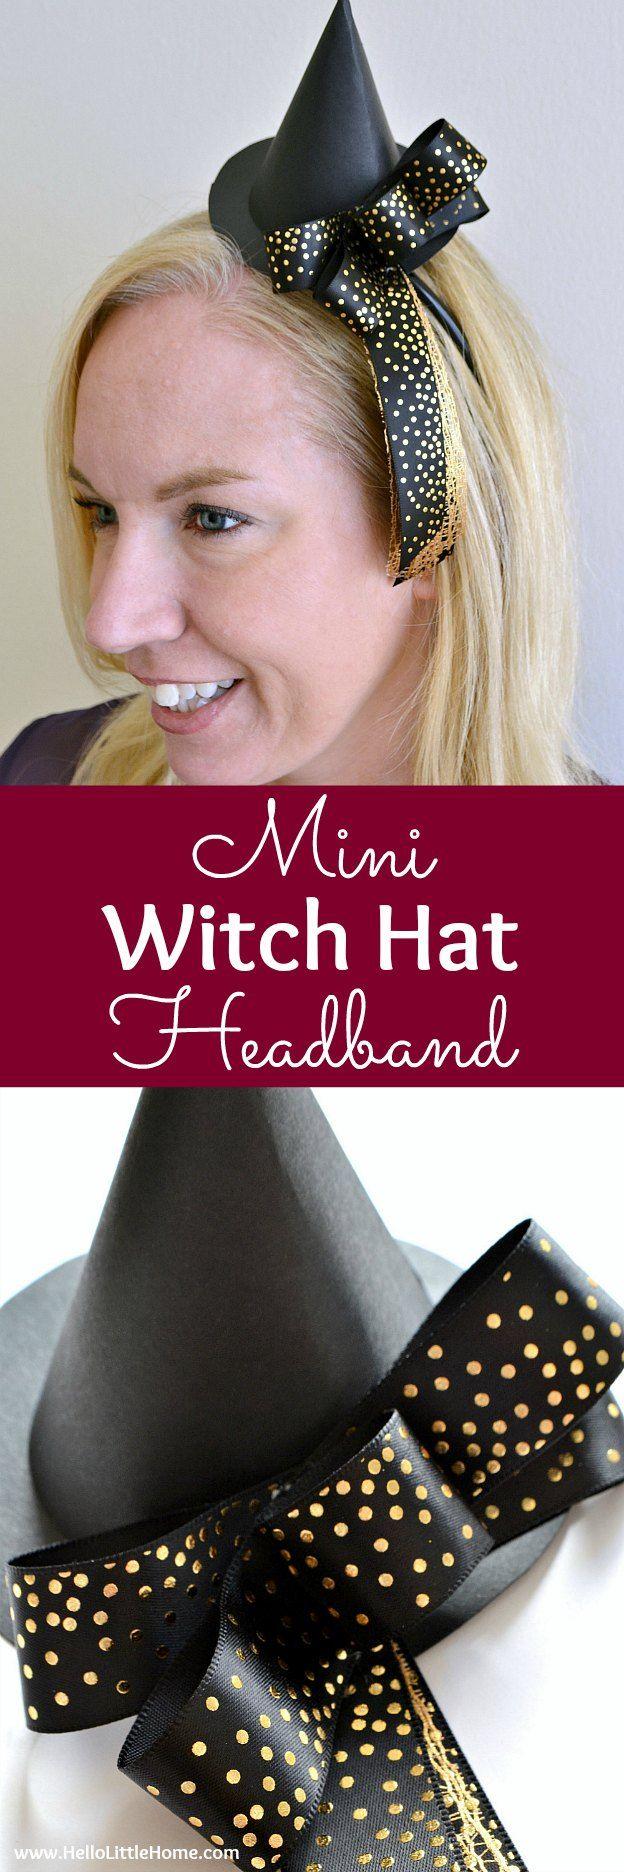 DIY Witch Hat Headband Headbands, Diy hat, Diy for kids